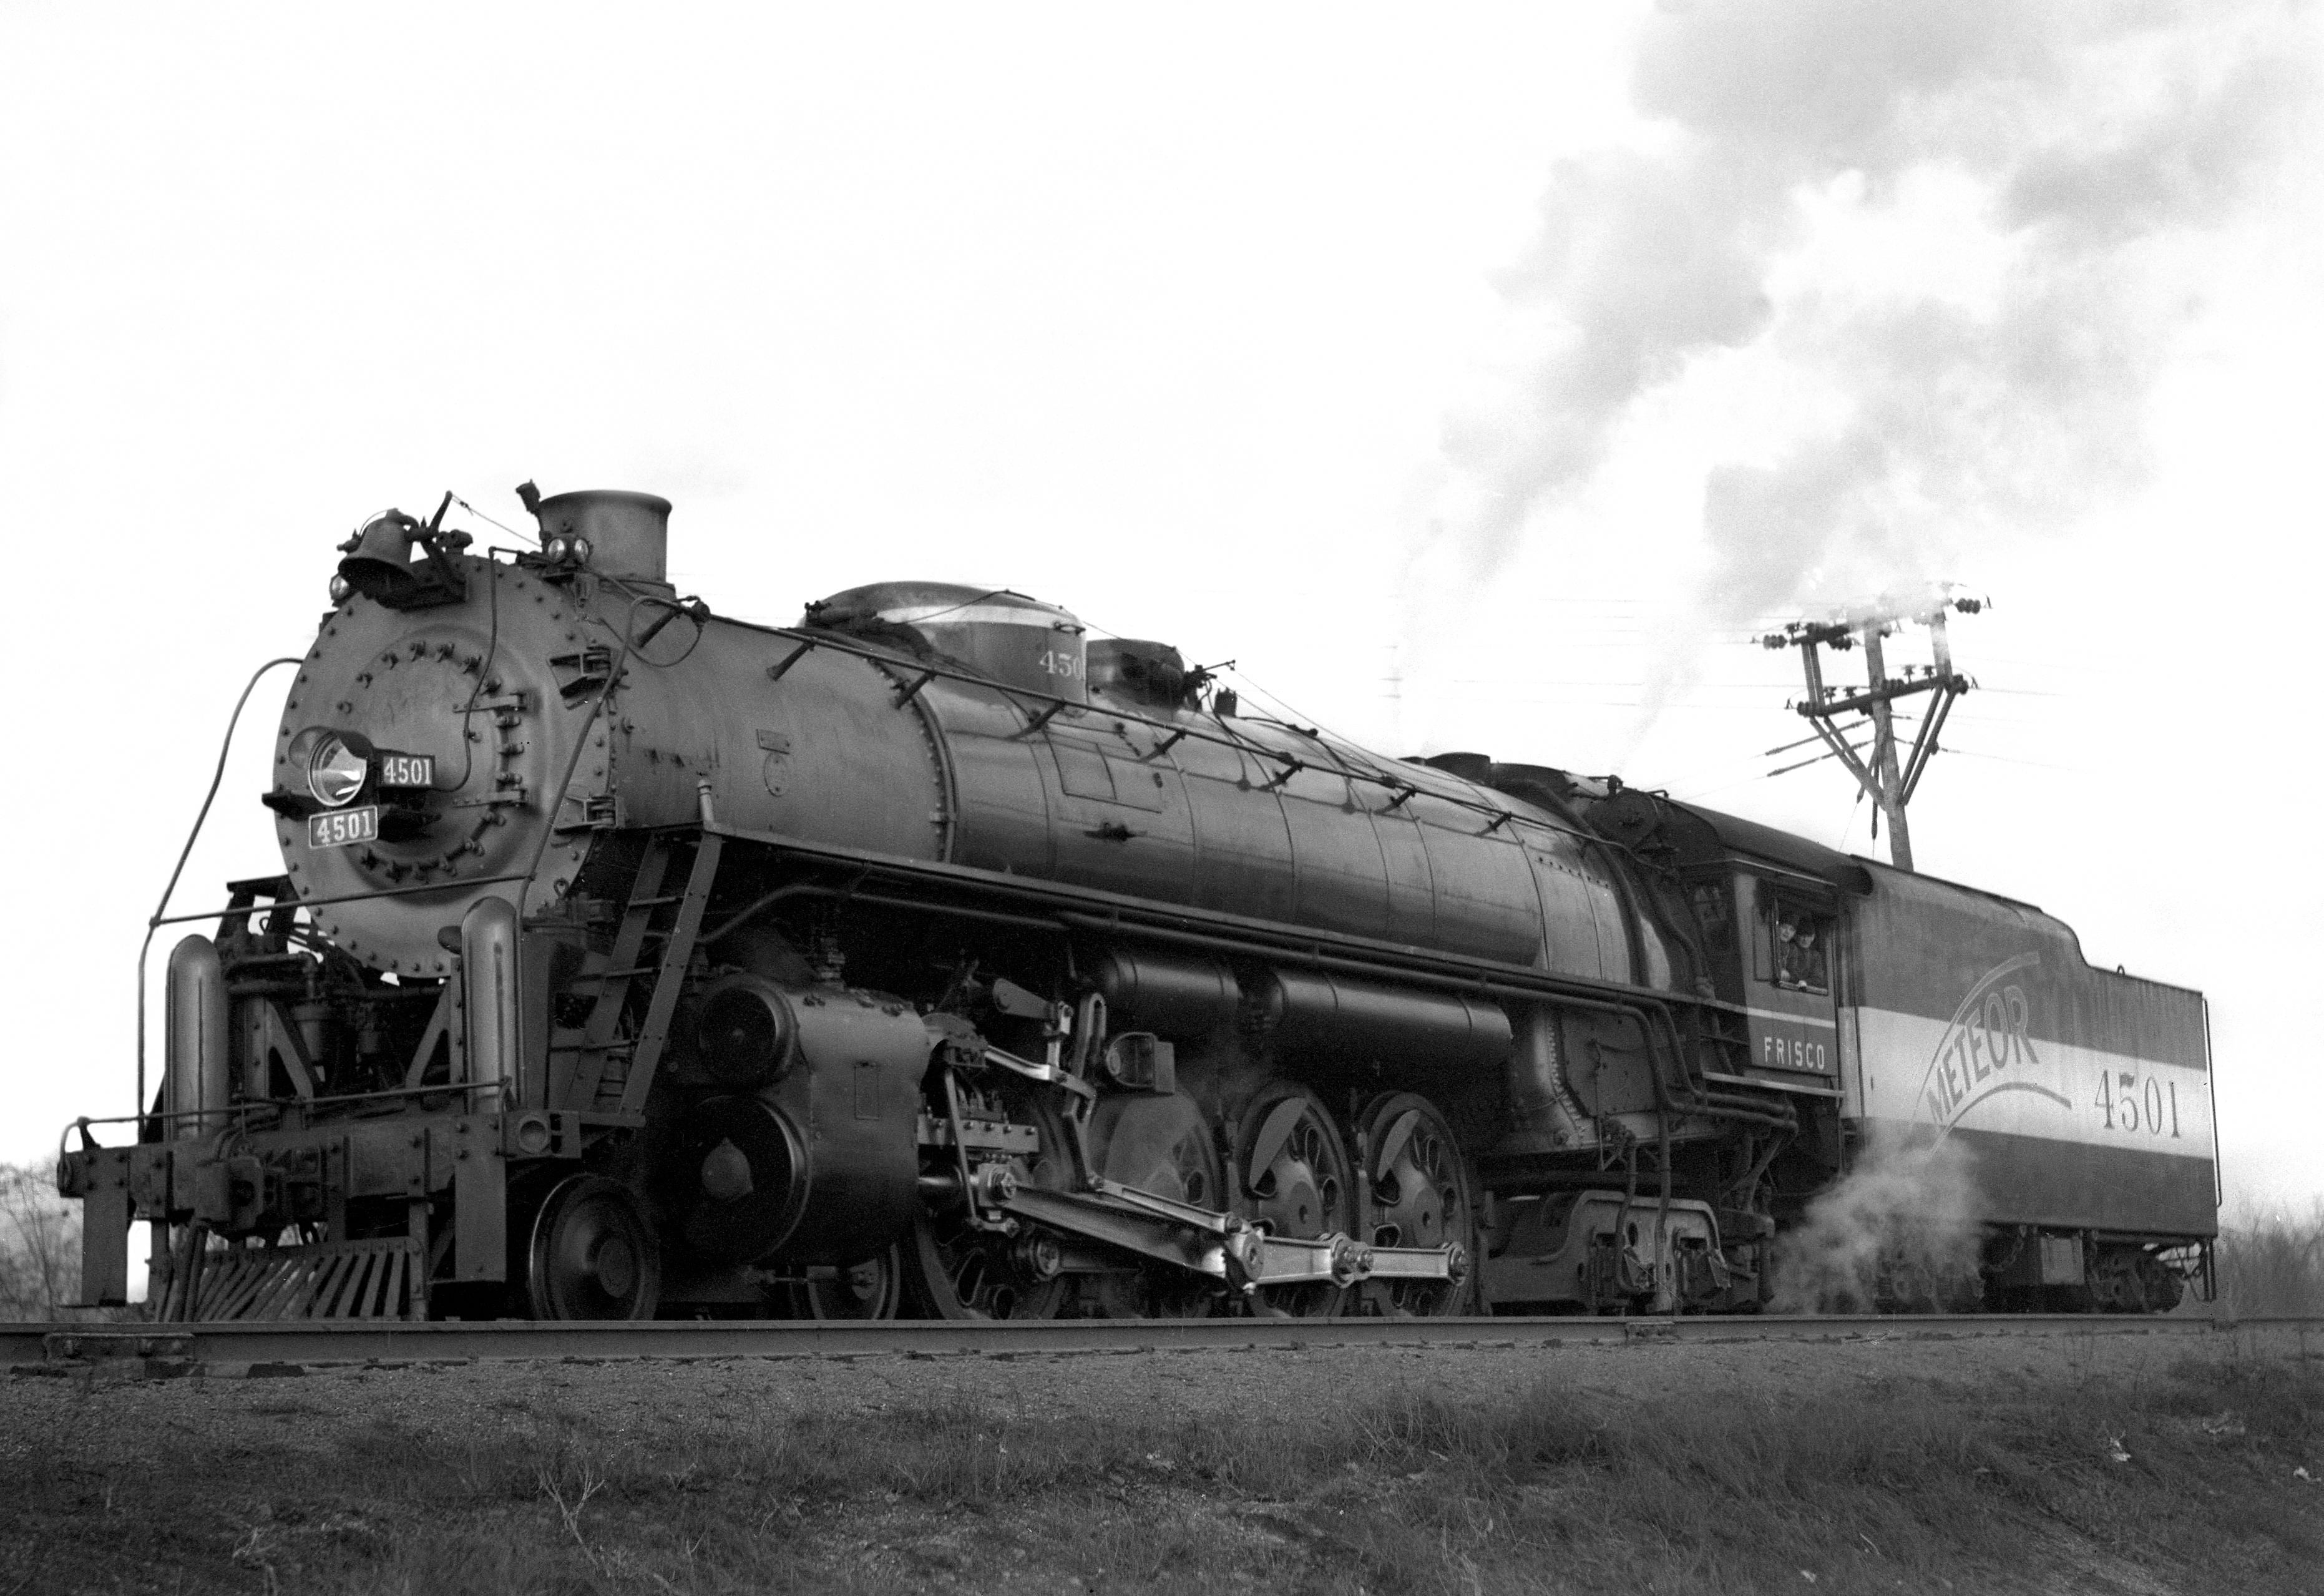 4-8-4 4501 New at Southeastern Junction, St. Louis, Missouri in October 1942 (William K. Barham)